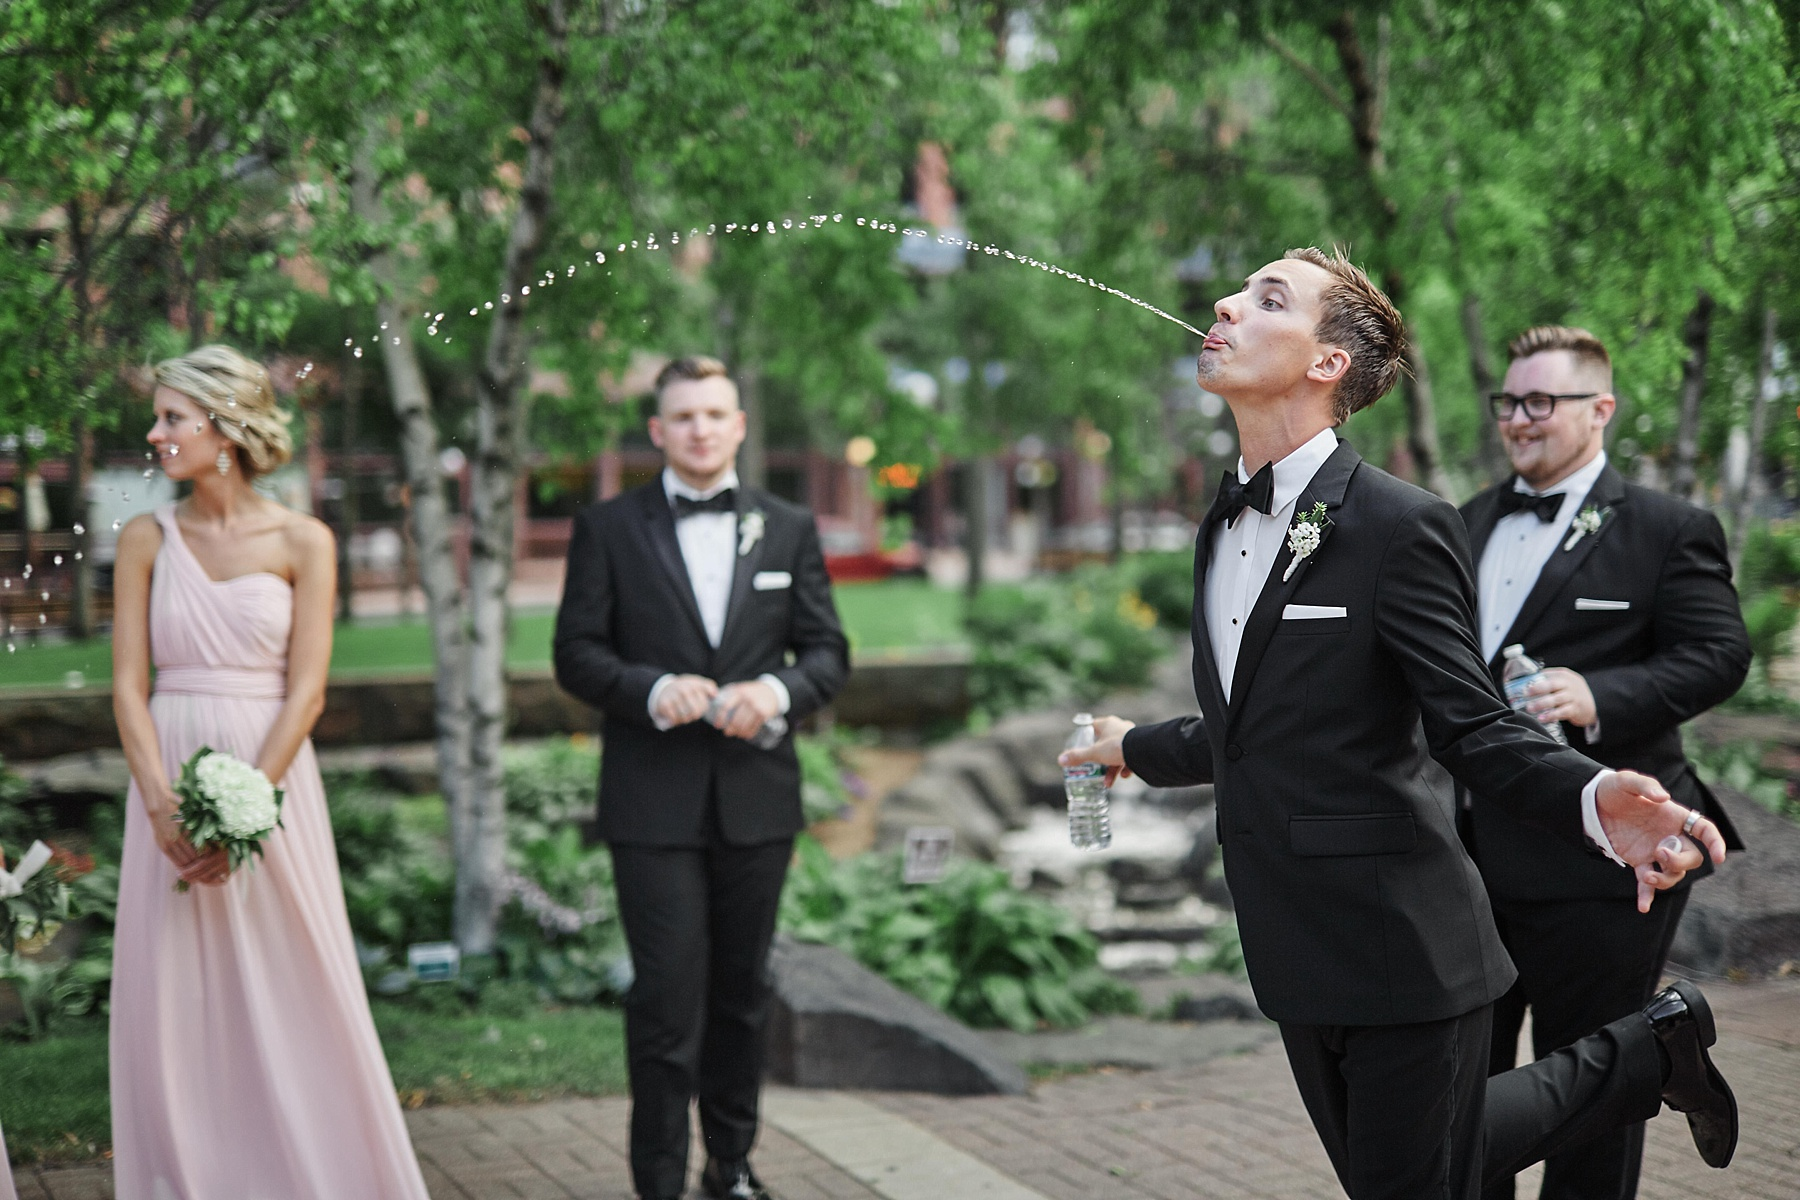 ABULAE-Wedding-Saint-paul-MN-Josh-Sofia-Wedding-Mears-Park_0780.jpg